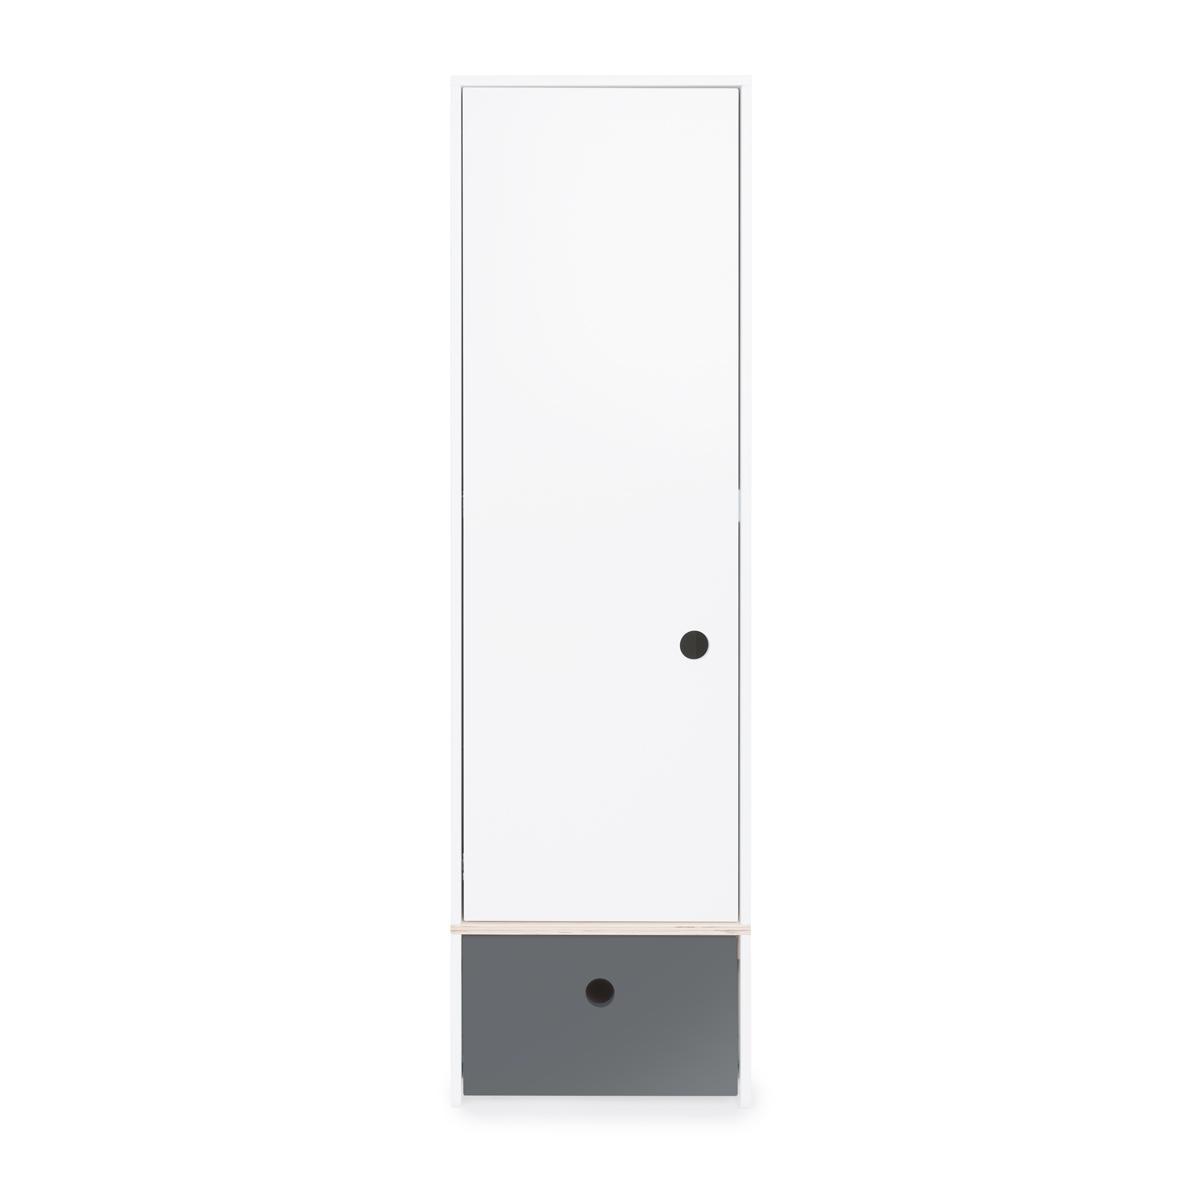 Armoire 1 porte COLORFLEX façade tiroir space grey